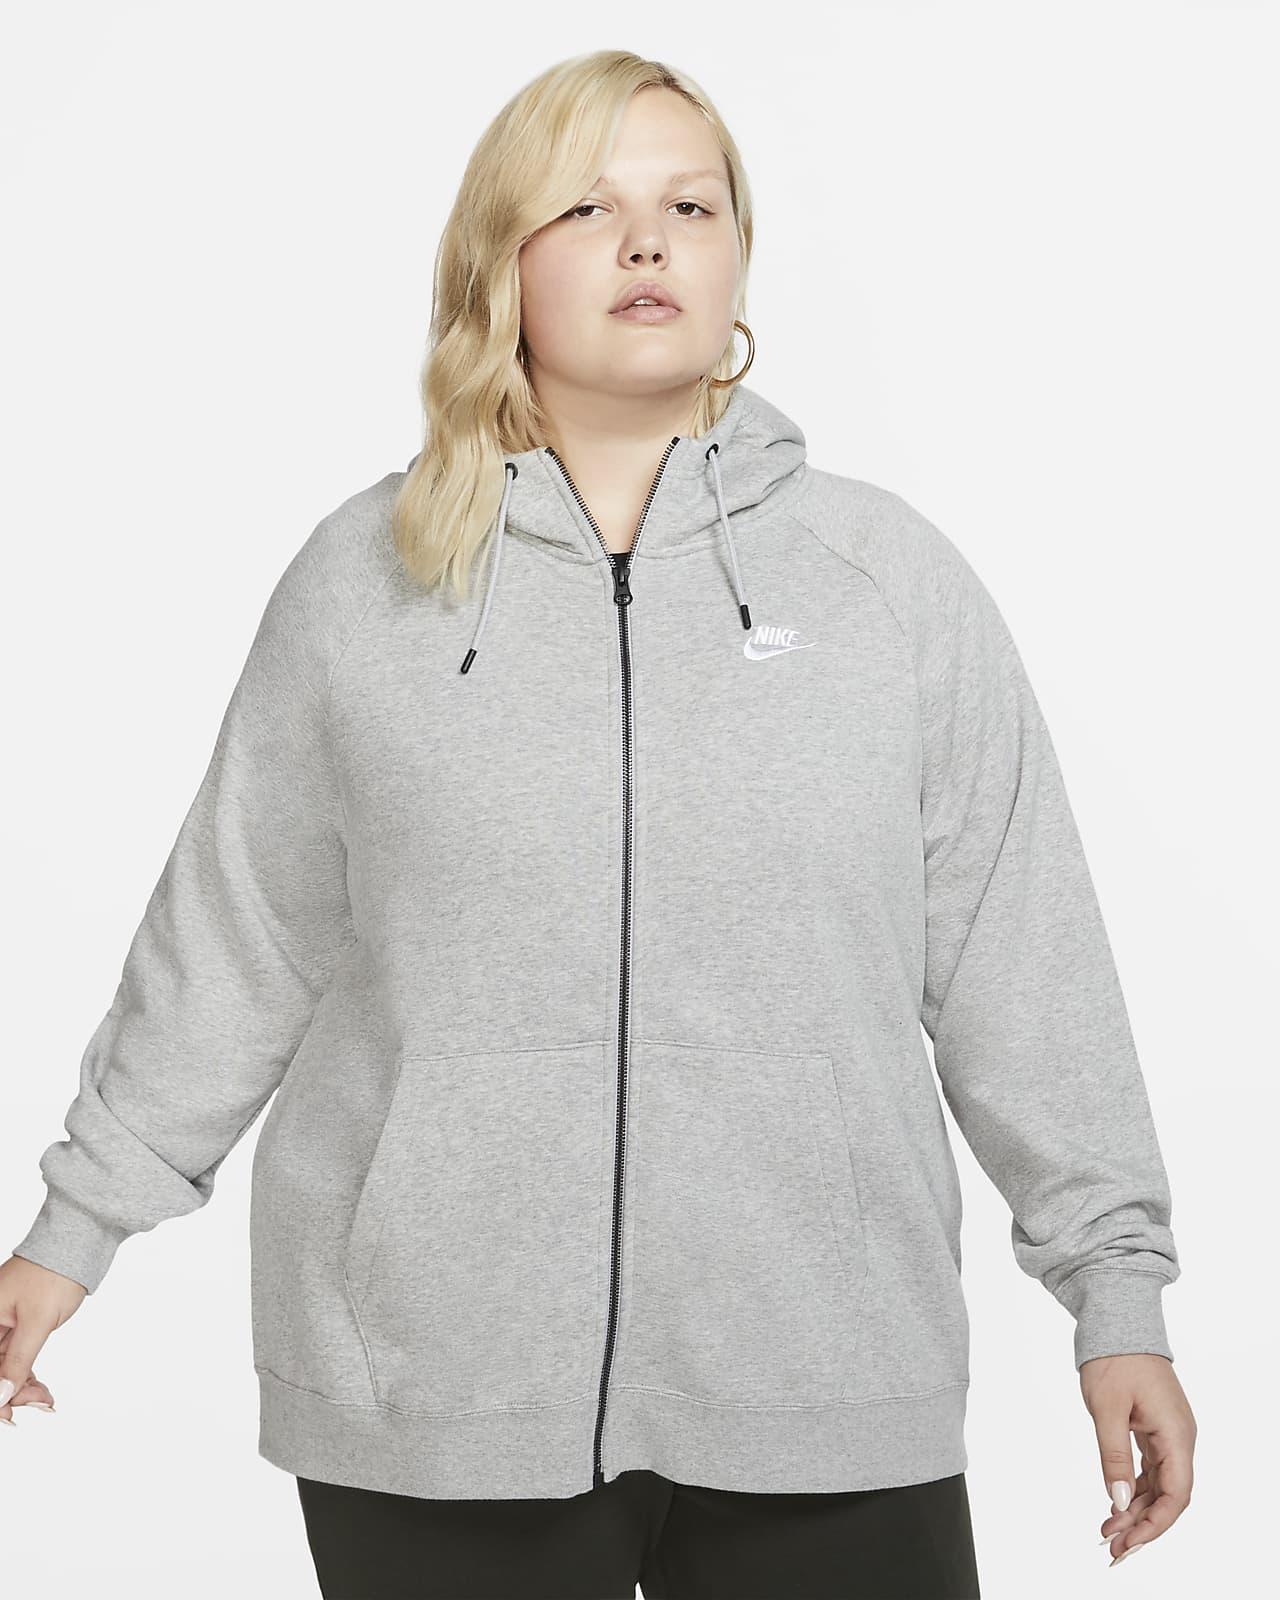 Nike Sportswear Essential hosszú cipzáras, kapucnis női pulóver (plus size méret)